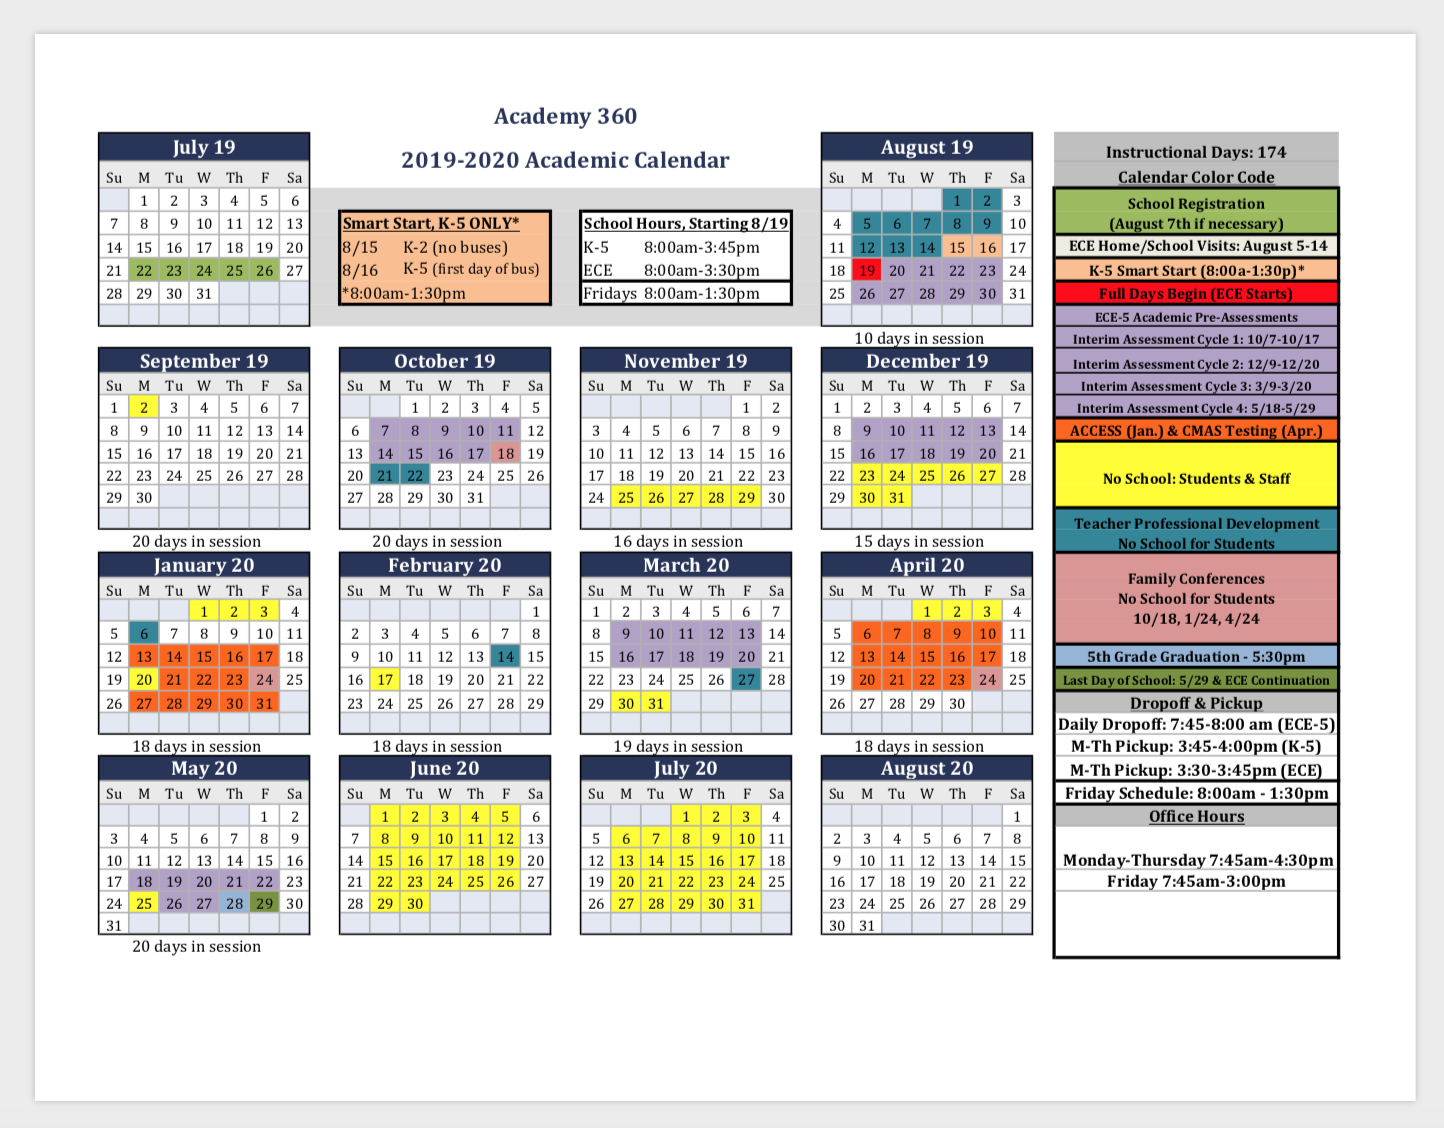 Academic Calendar 2020 2020 - Wpa.wpart.co